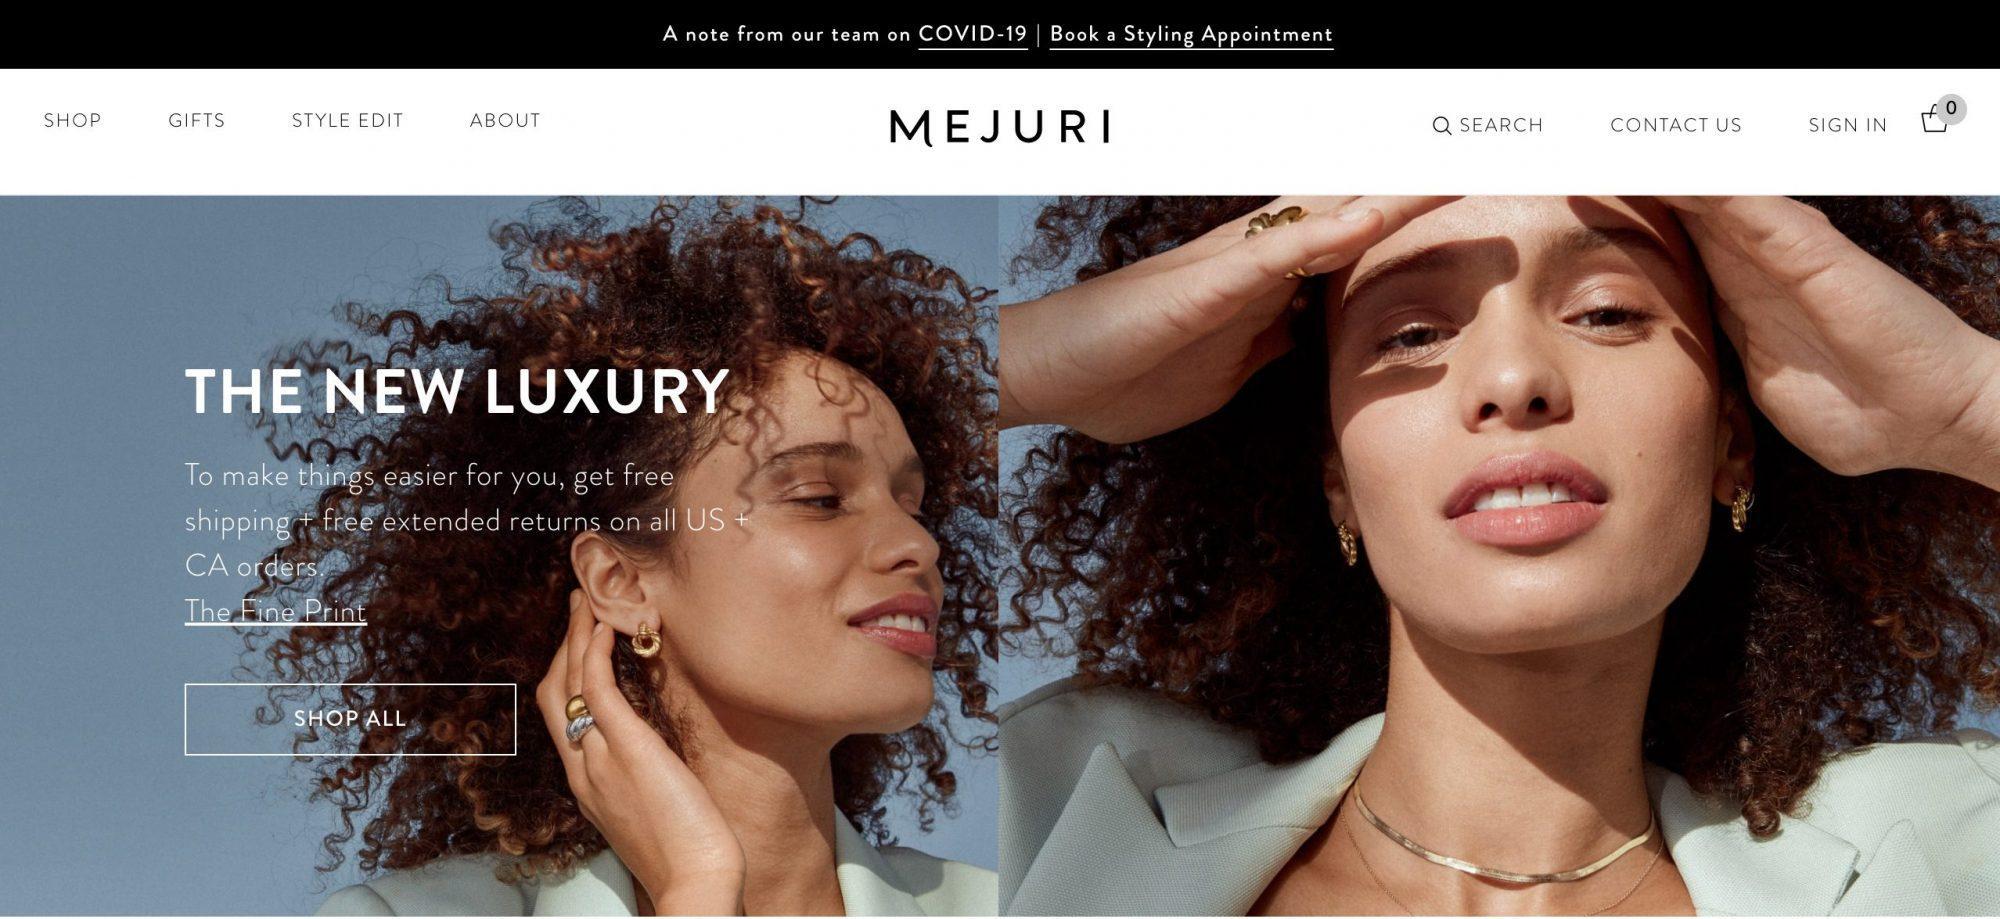 Mejuri Fine Toronto-based Jewelry E-commerce Company Website Home